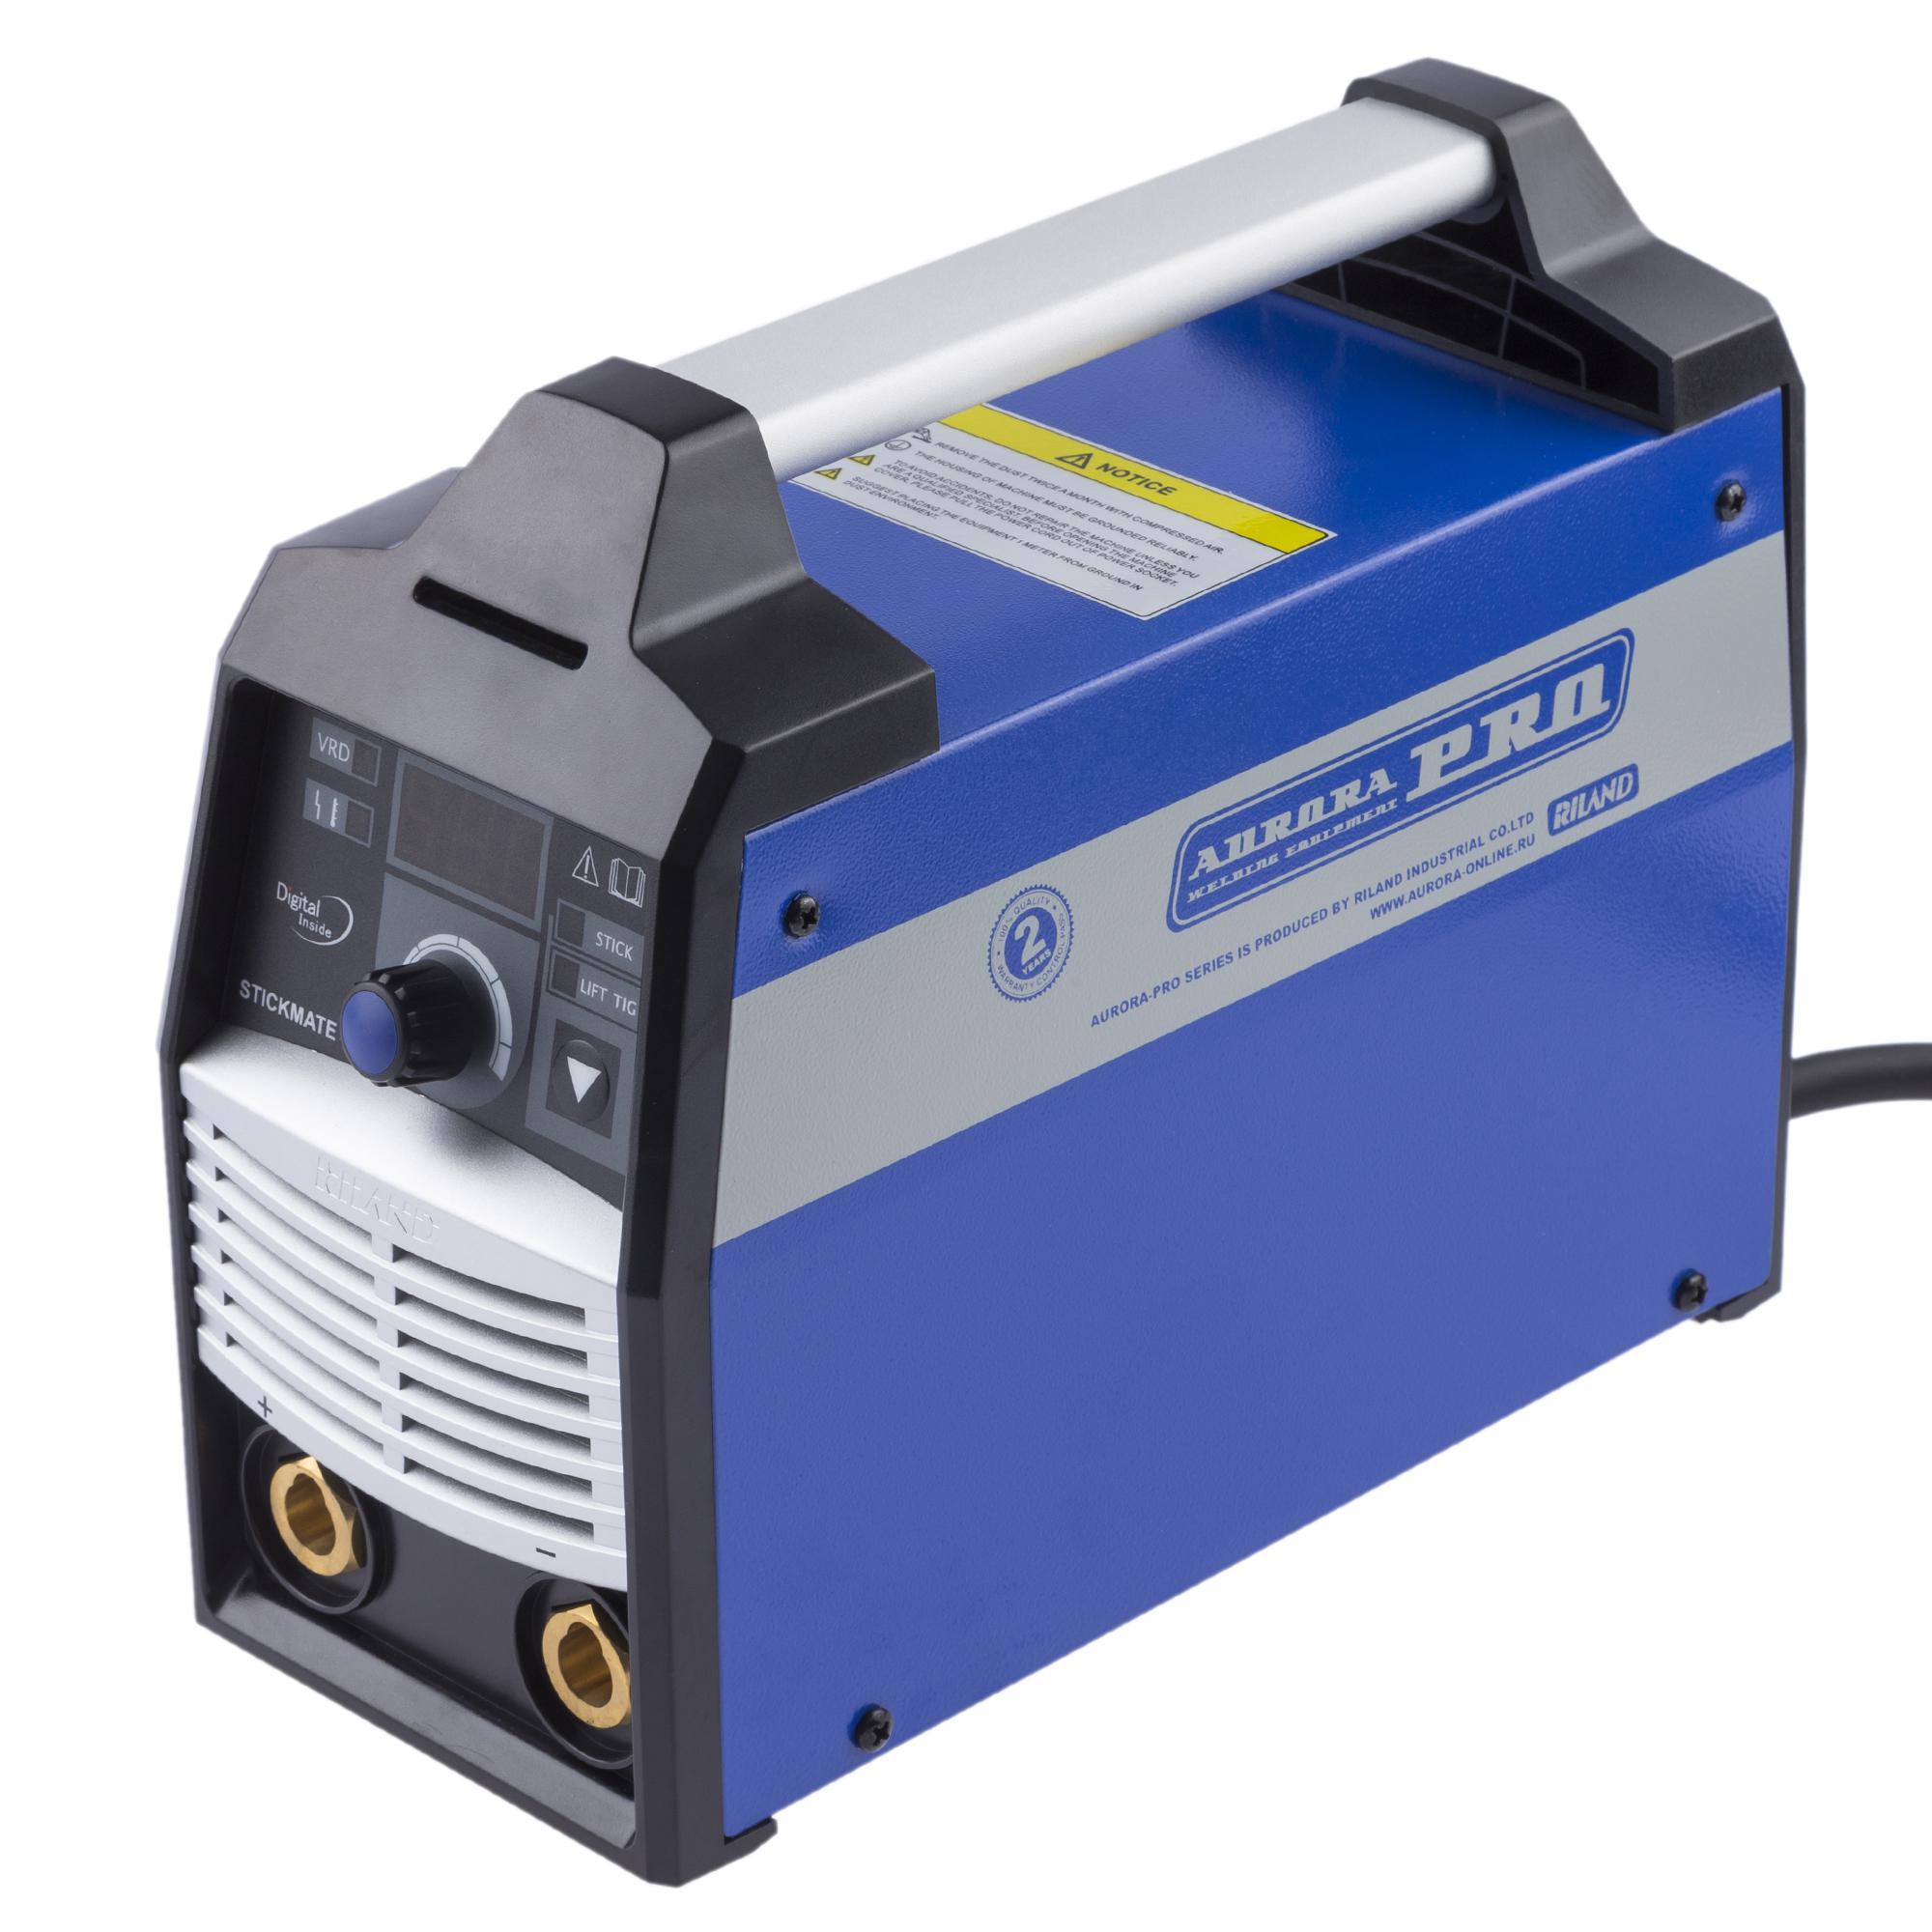 Сварочный аппарат Aurora pro Stickmate 185 26649